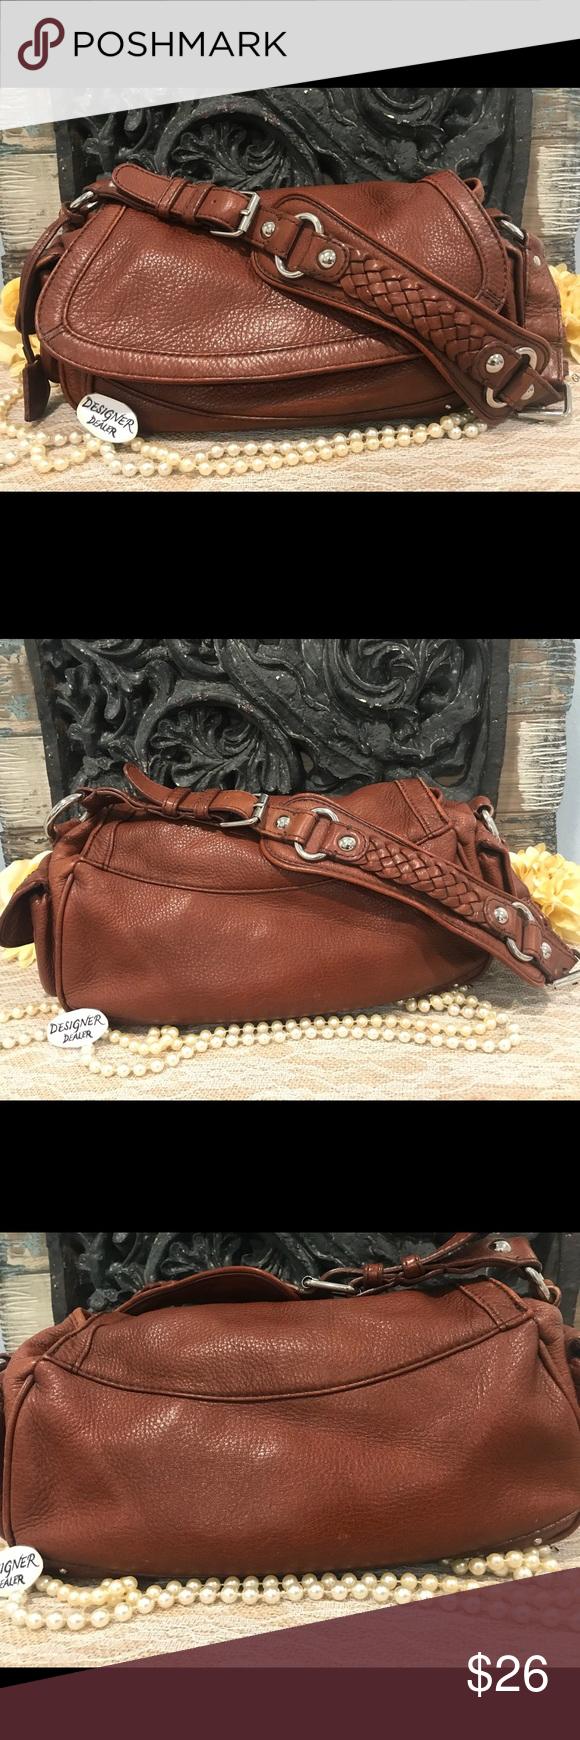 BANANA REPUBLIC Cognac Brown Leather Shoulder Bag Brown